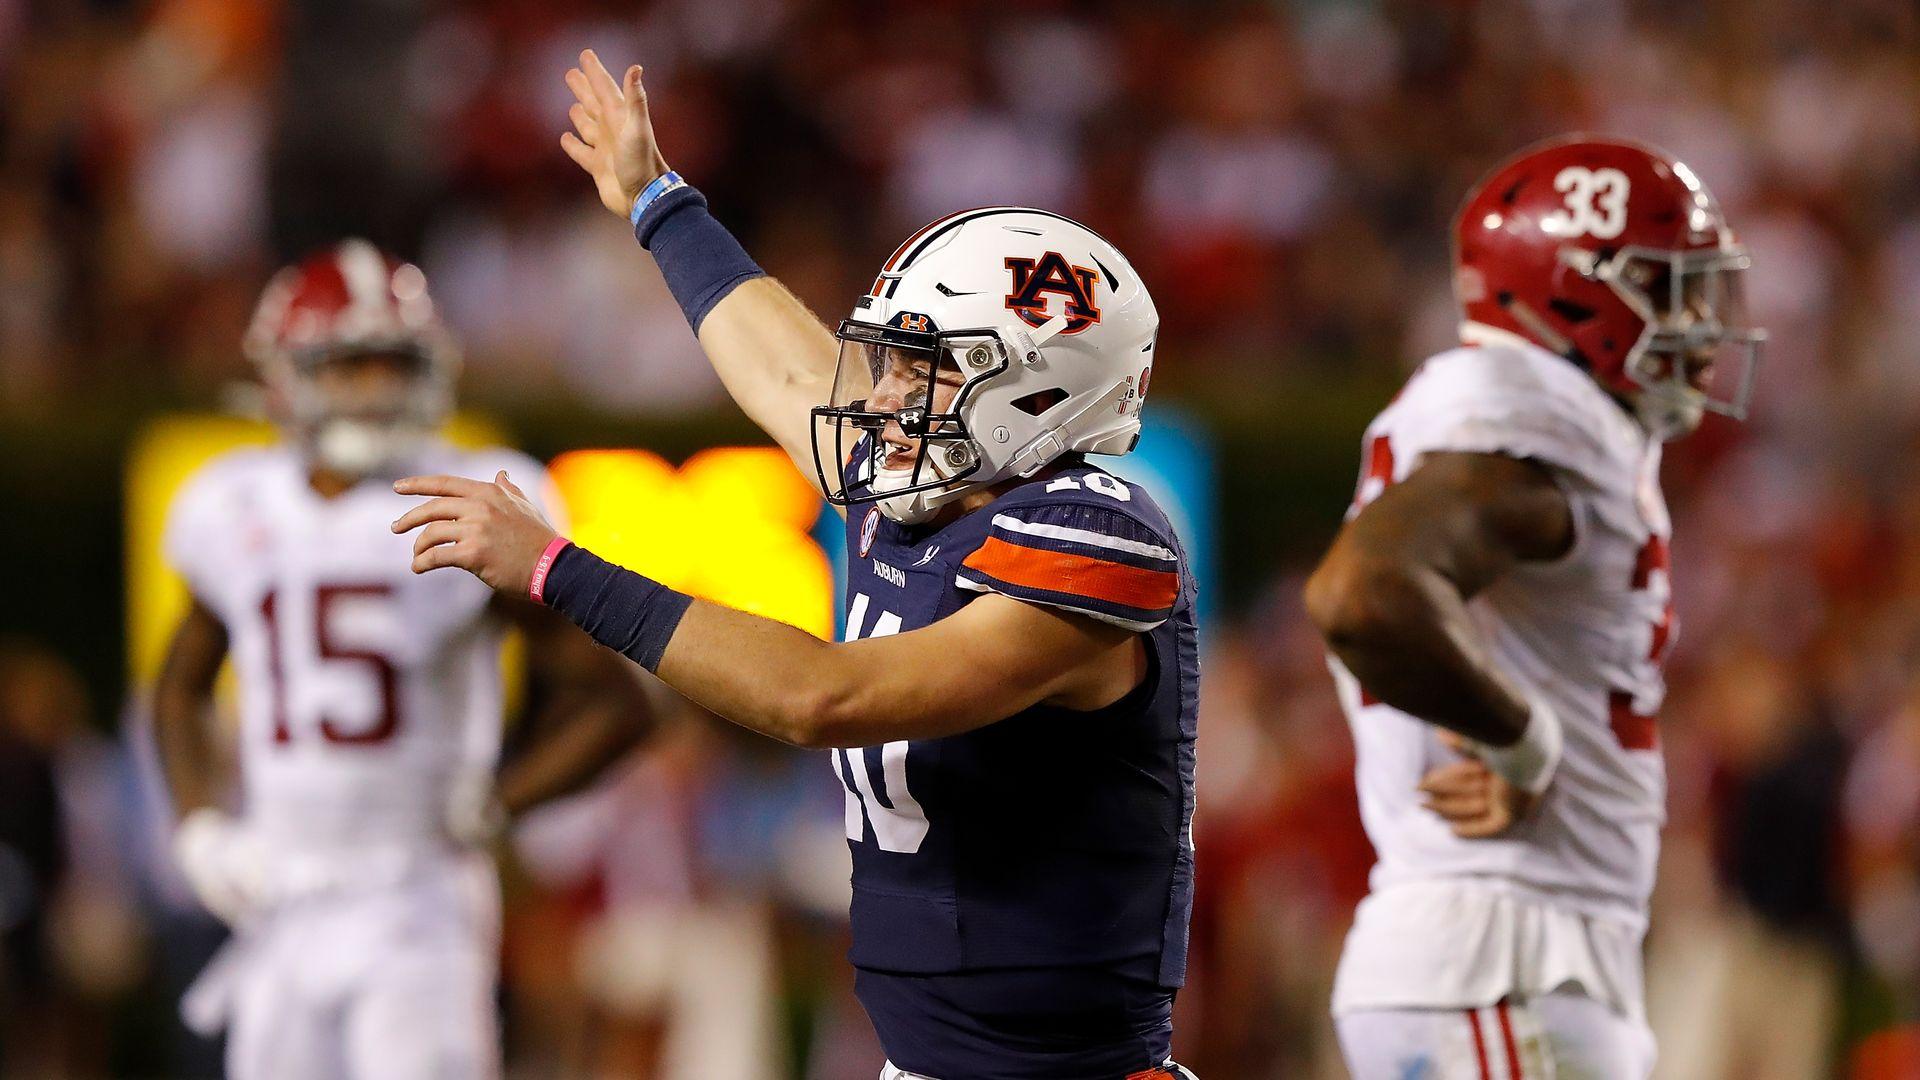 Alabama S Loss To Auburn Sets Up A Final College Football